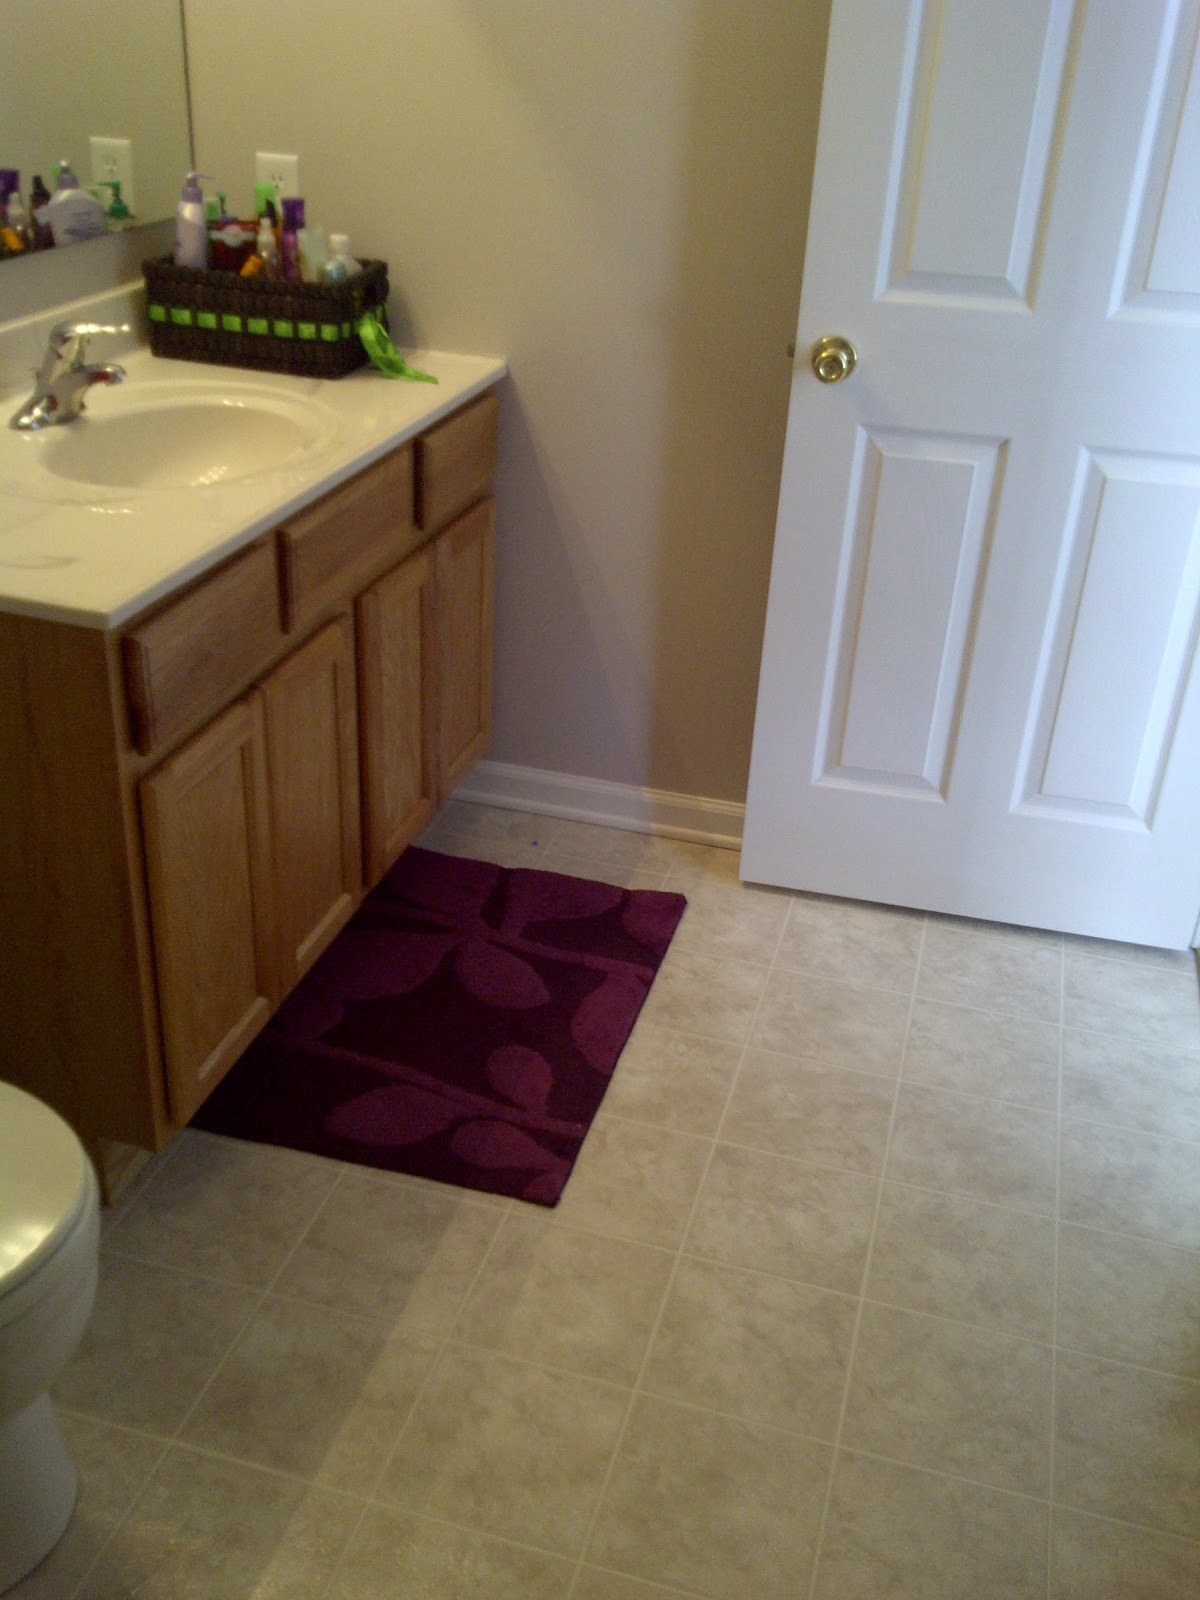 Misadventures in diy bathroom vanity oakness makeover